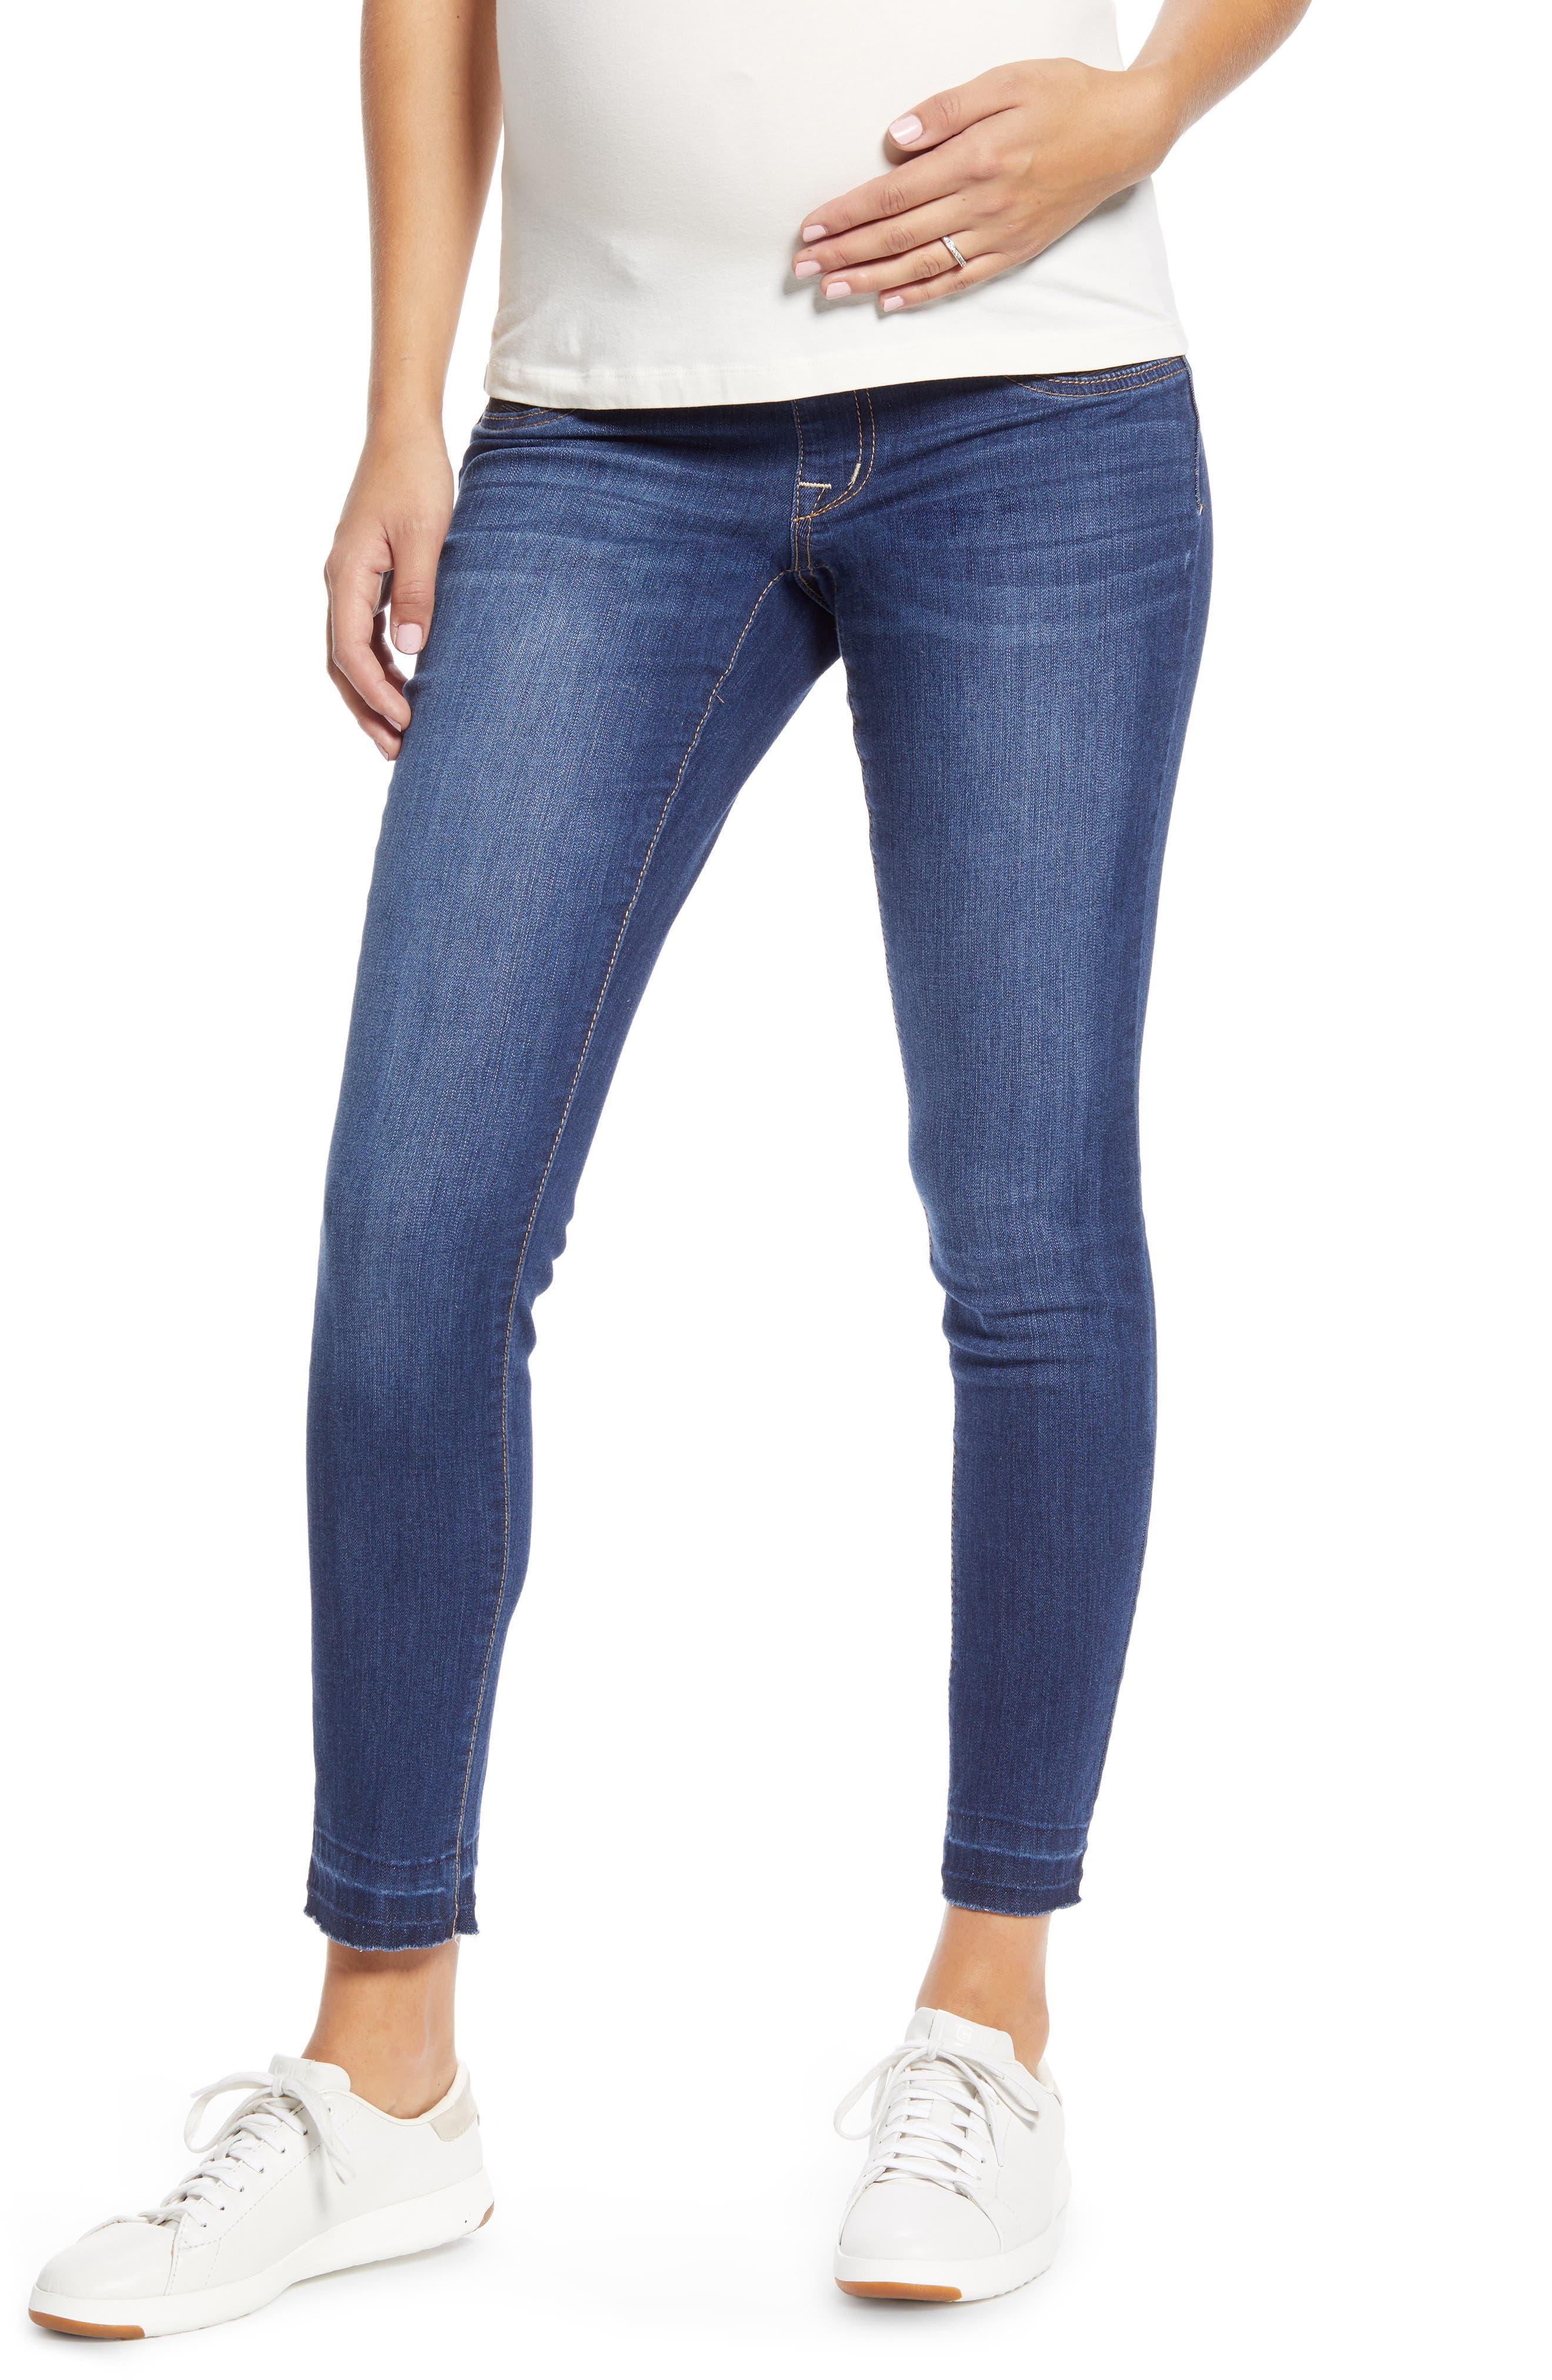 Women's 1822 Denim Released Raw Hem Maternity Skinny Jeans